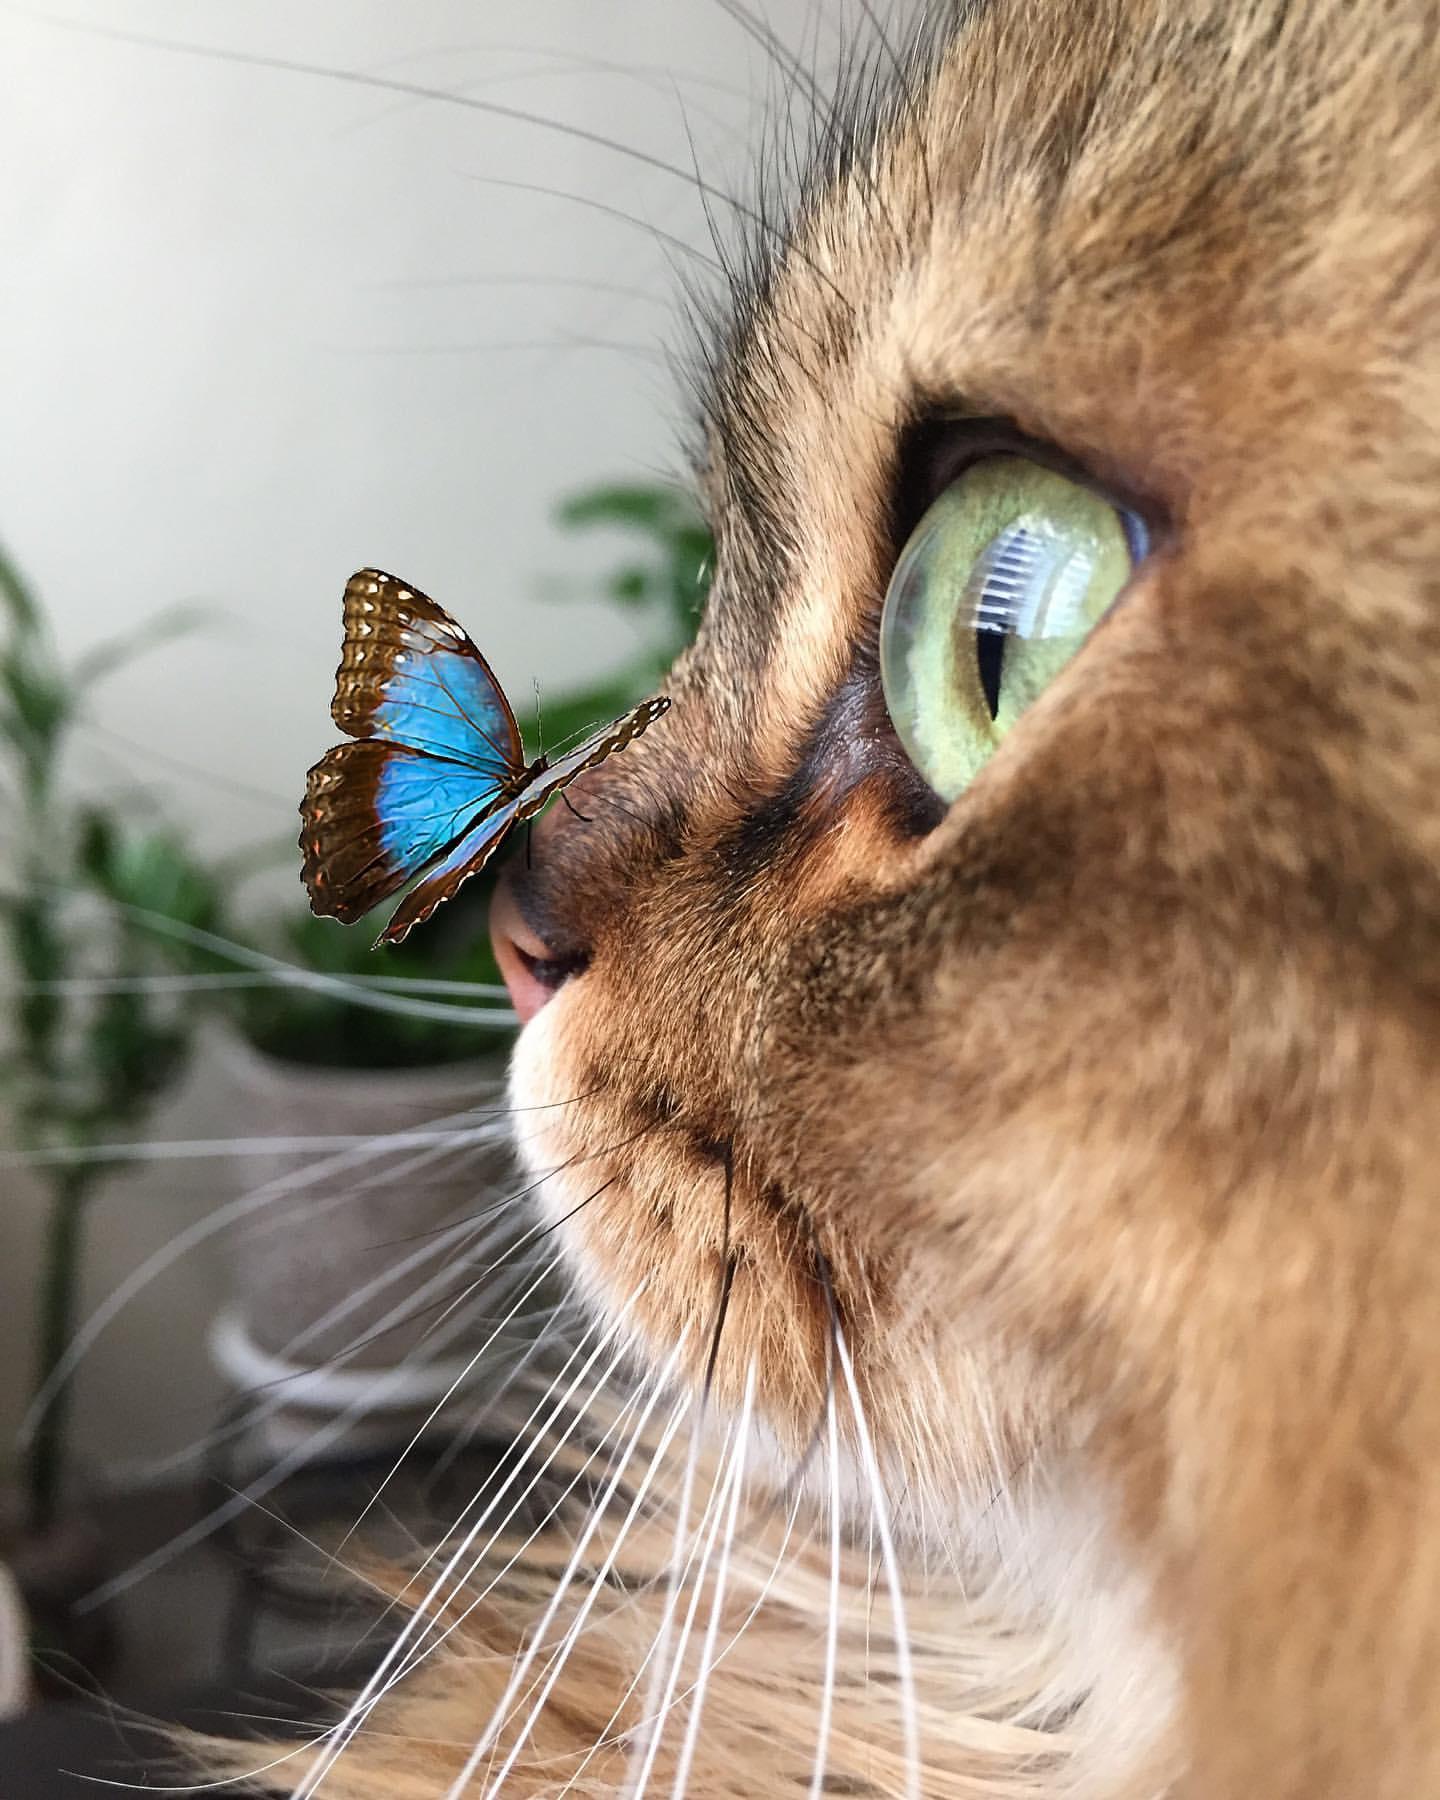 Кошка с бабочкой на носу картинка